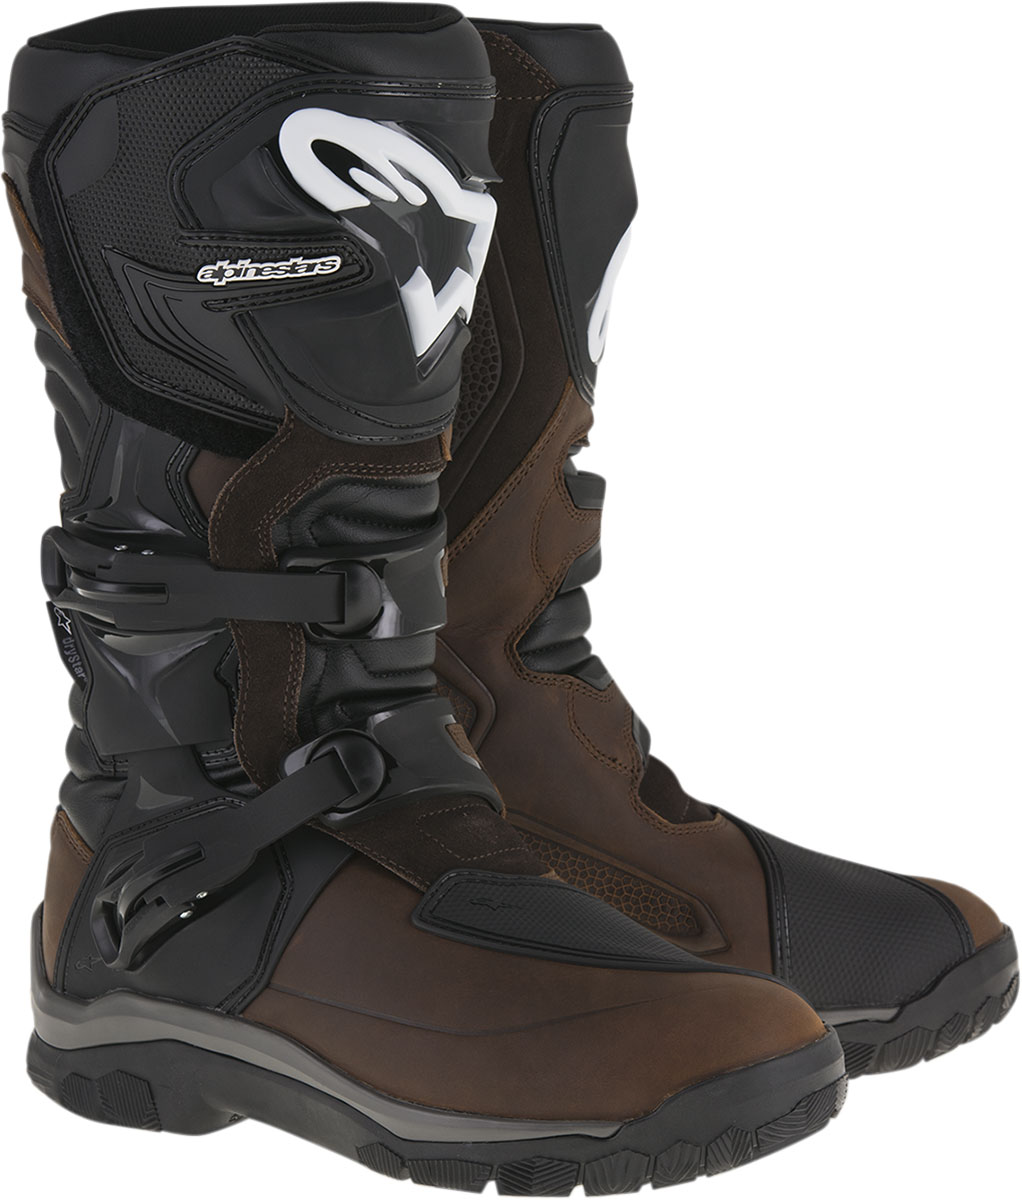 Alpinestars COROZAL Drystar Oiled Leather Adventure Touring Boots (Brown)